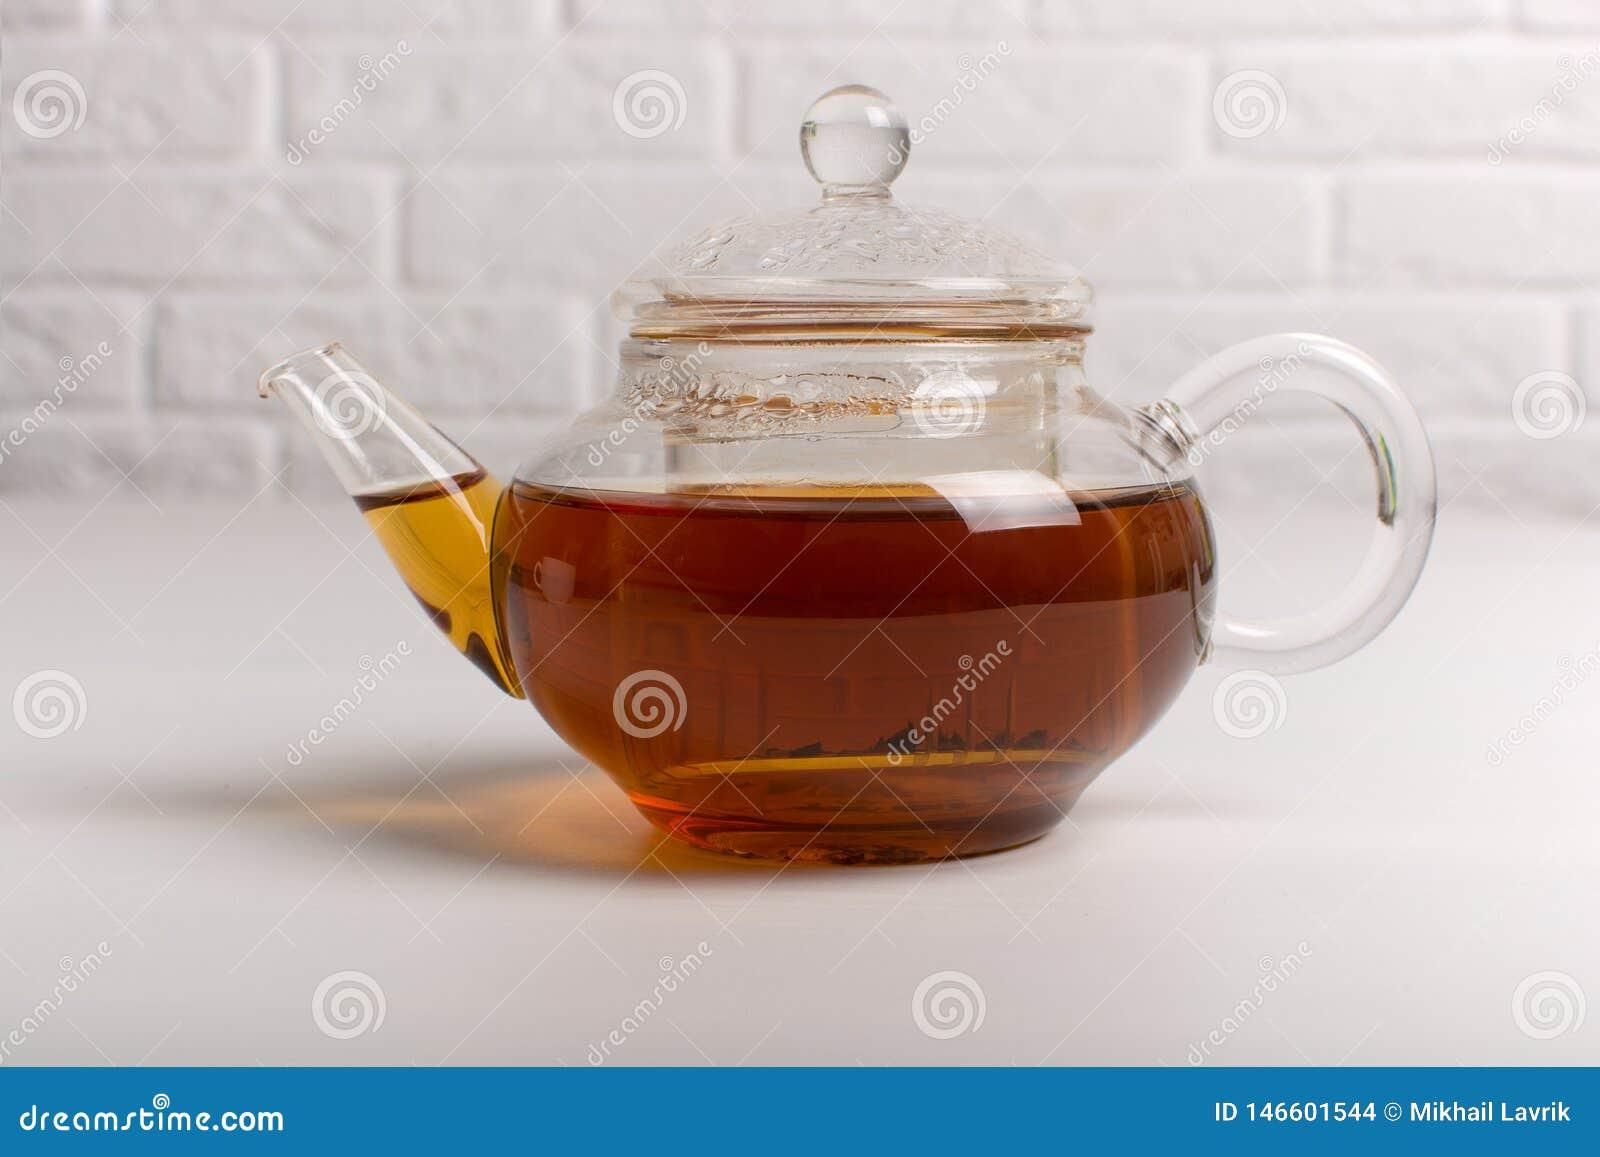 Teapot with black tea.